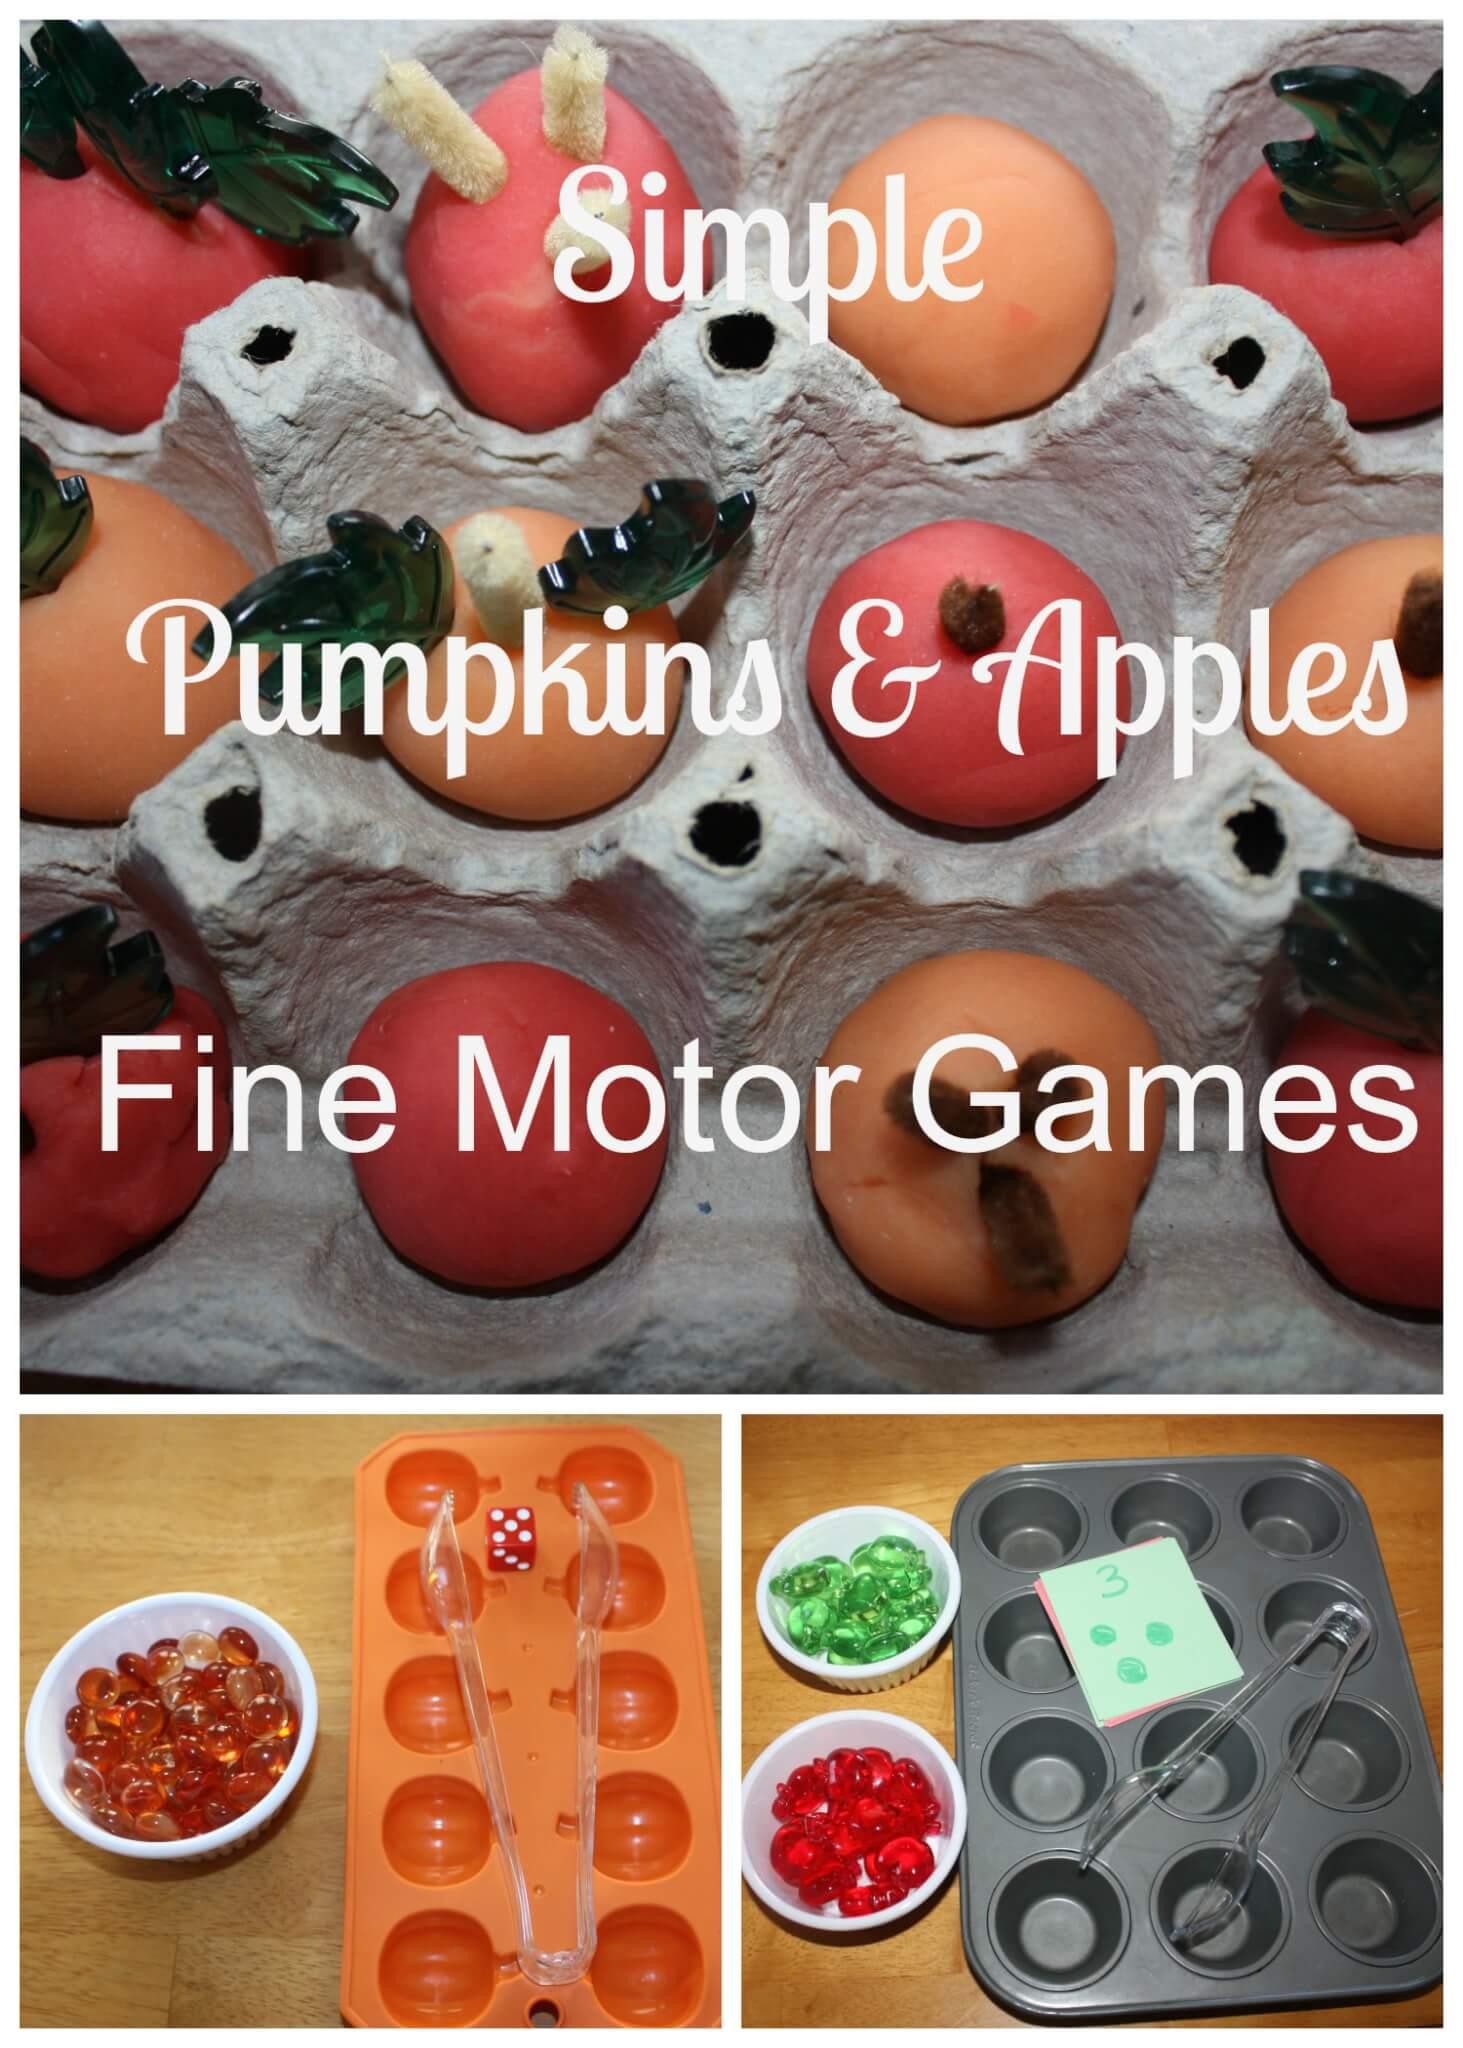 Simple Pumpkin And Apples Fine Motor Skills Games